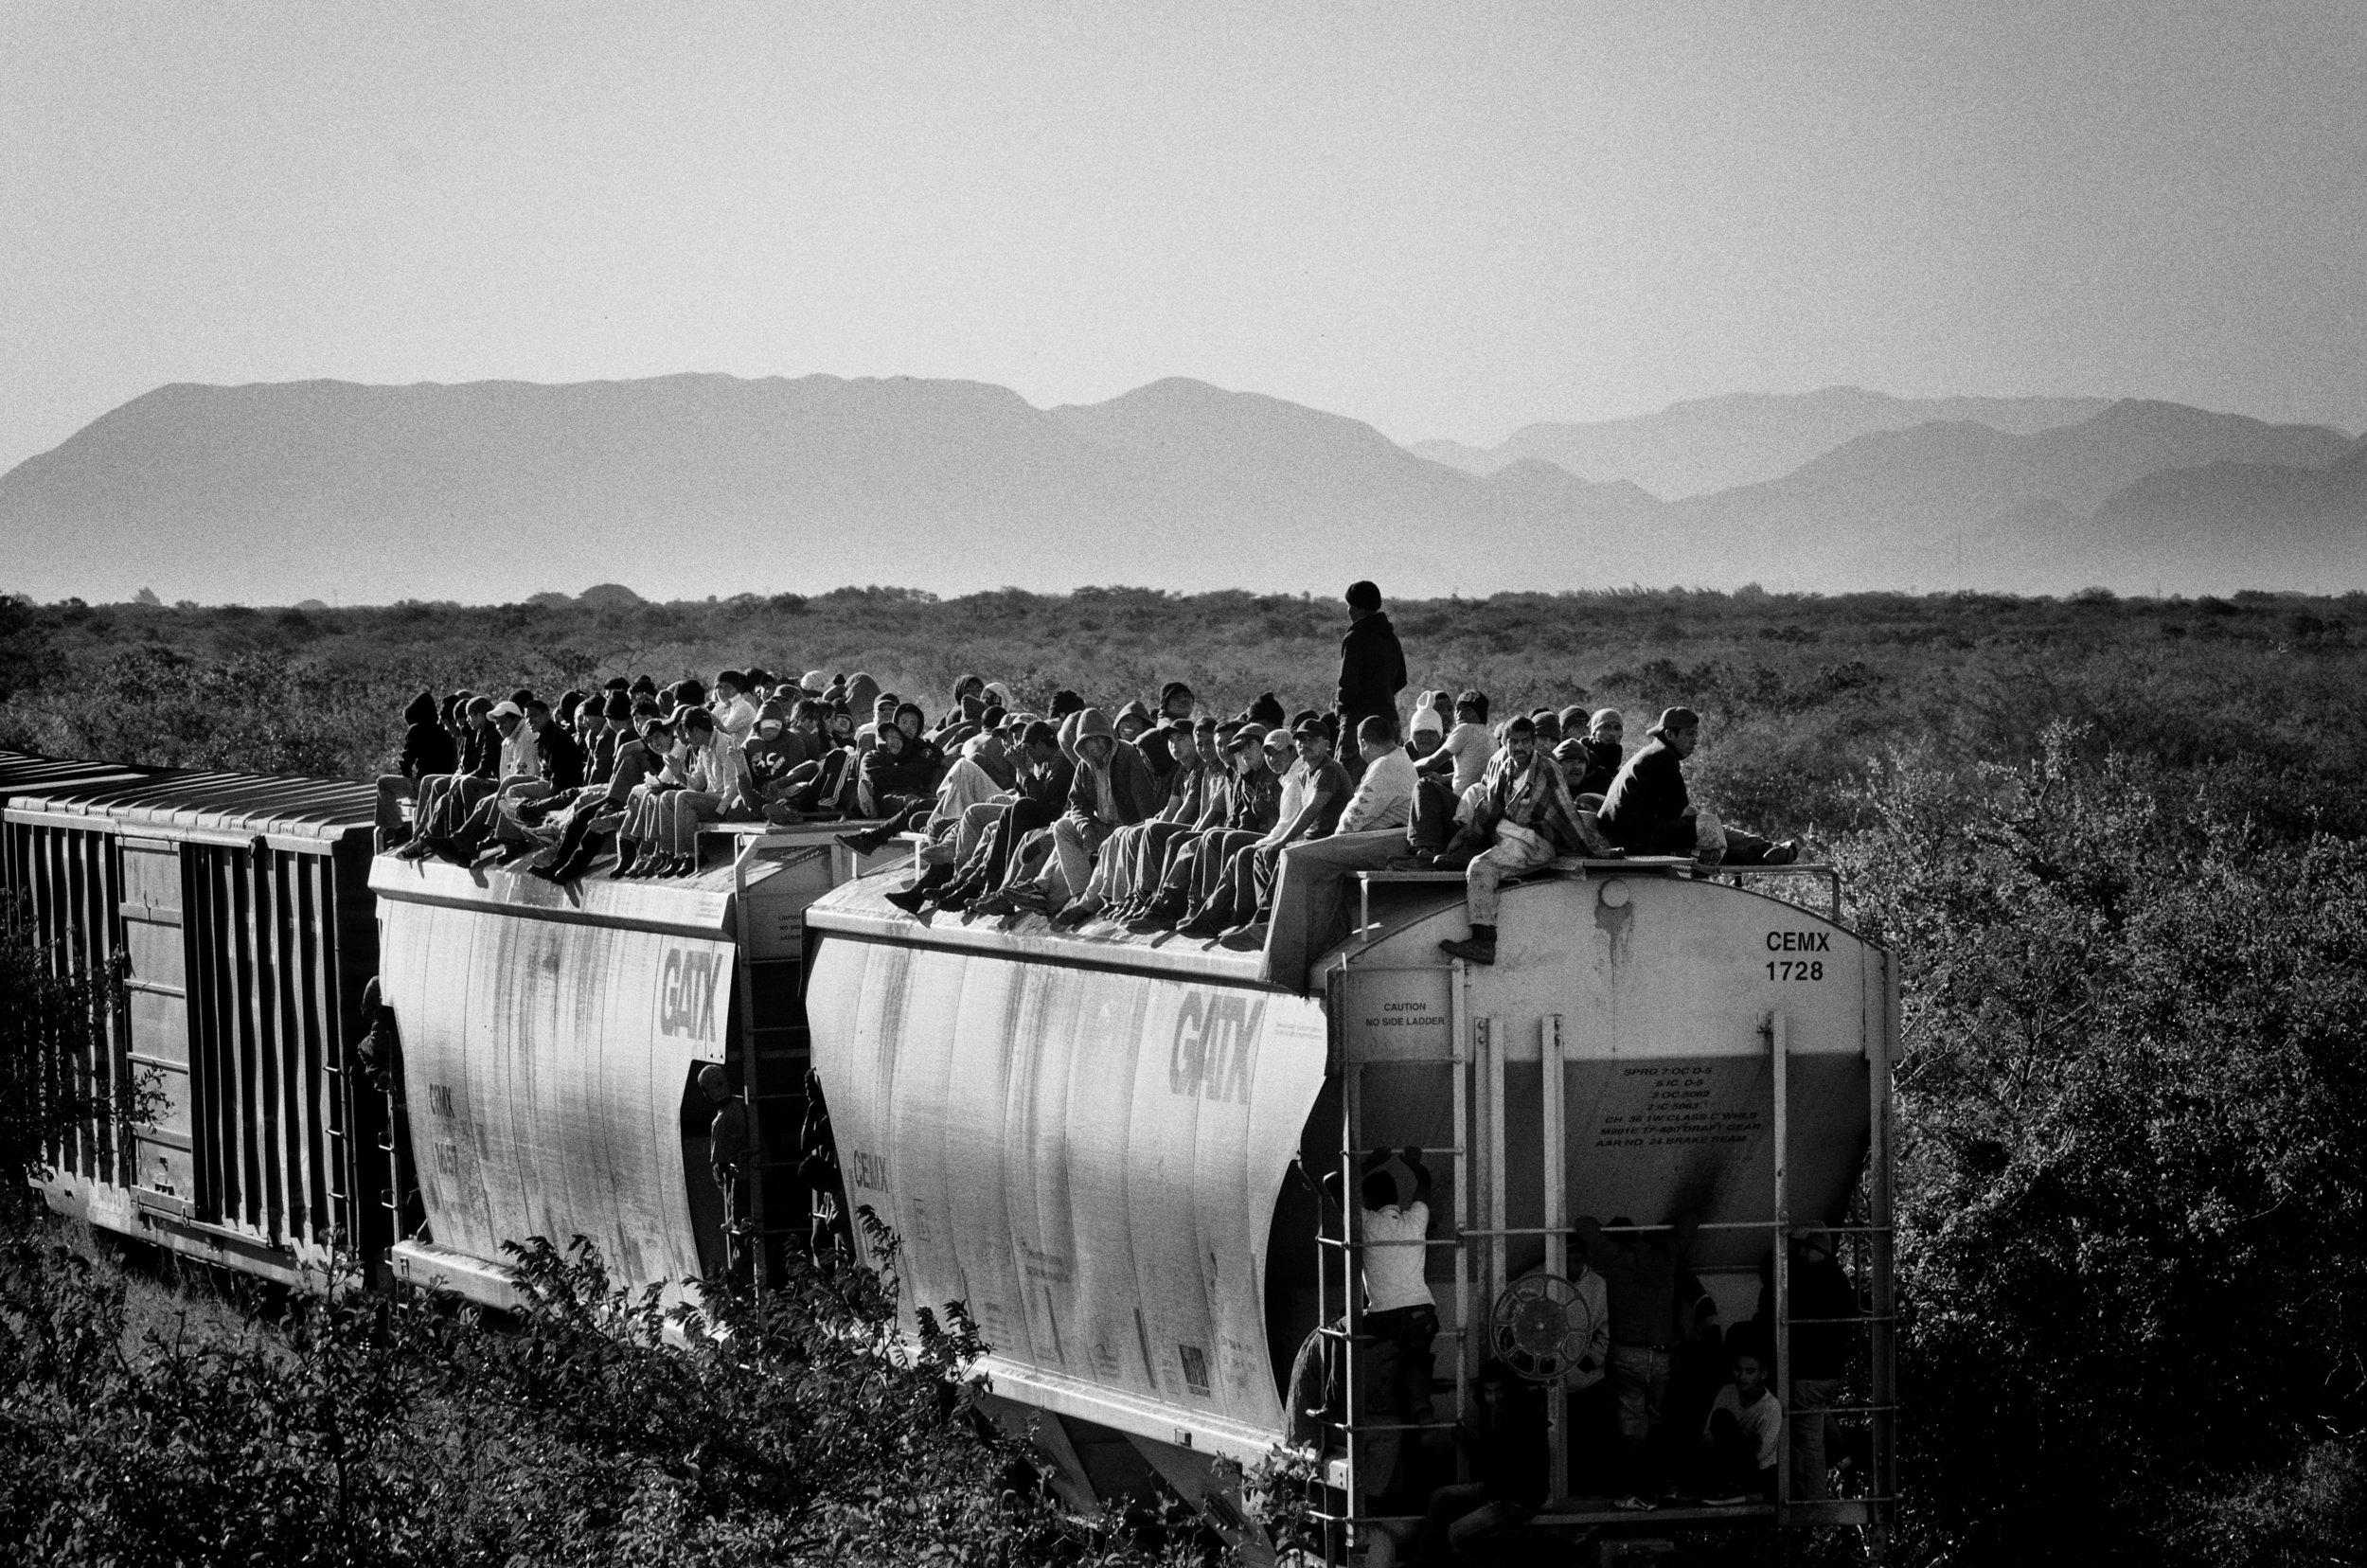 Via Panam, migration in the America's, Mexico